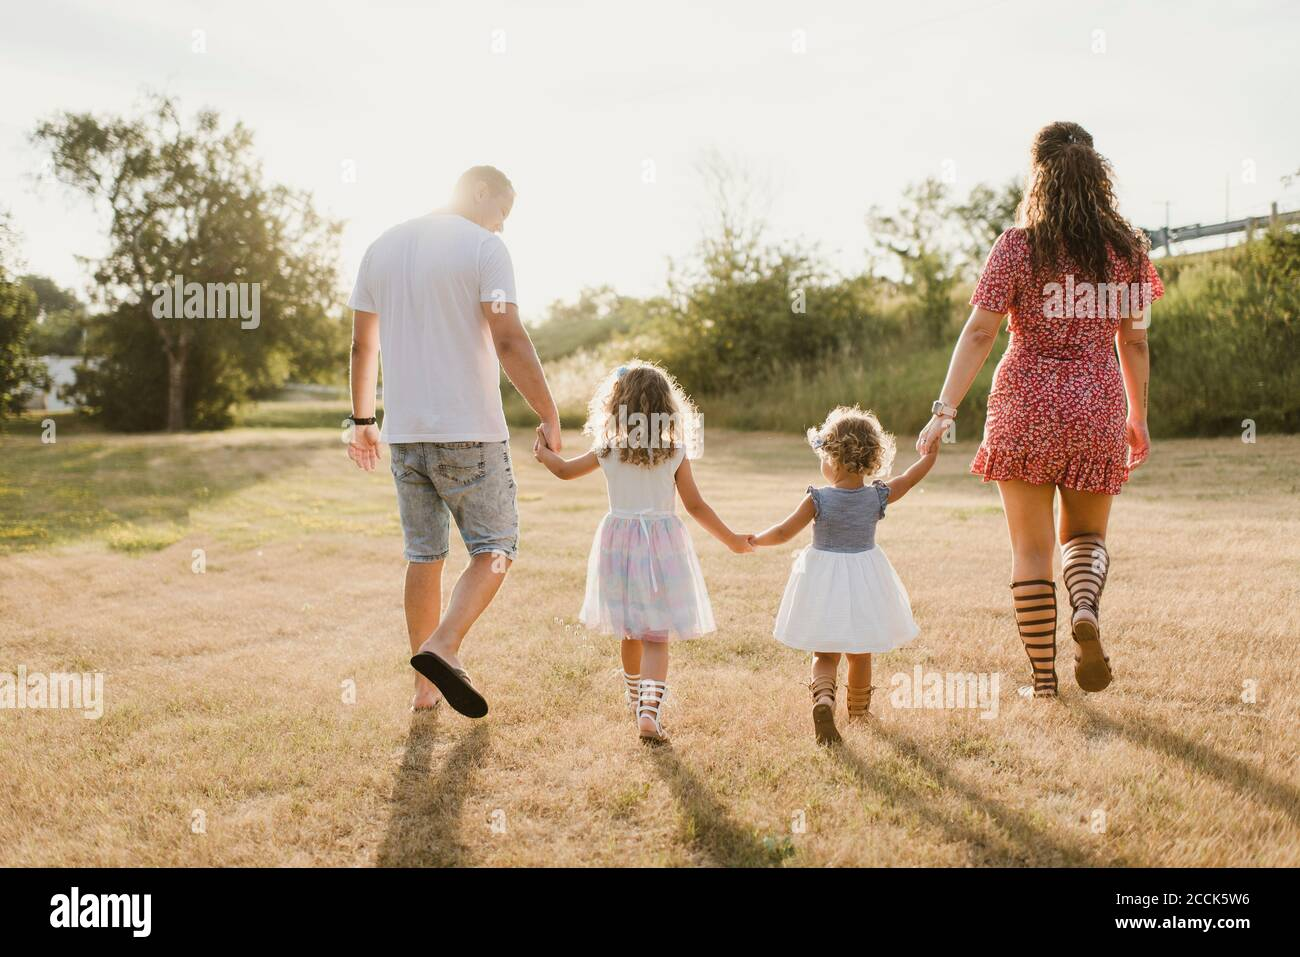 Familia caminando en un prado a contraluz Foto de stock